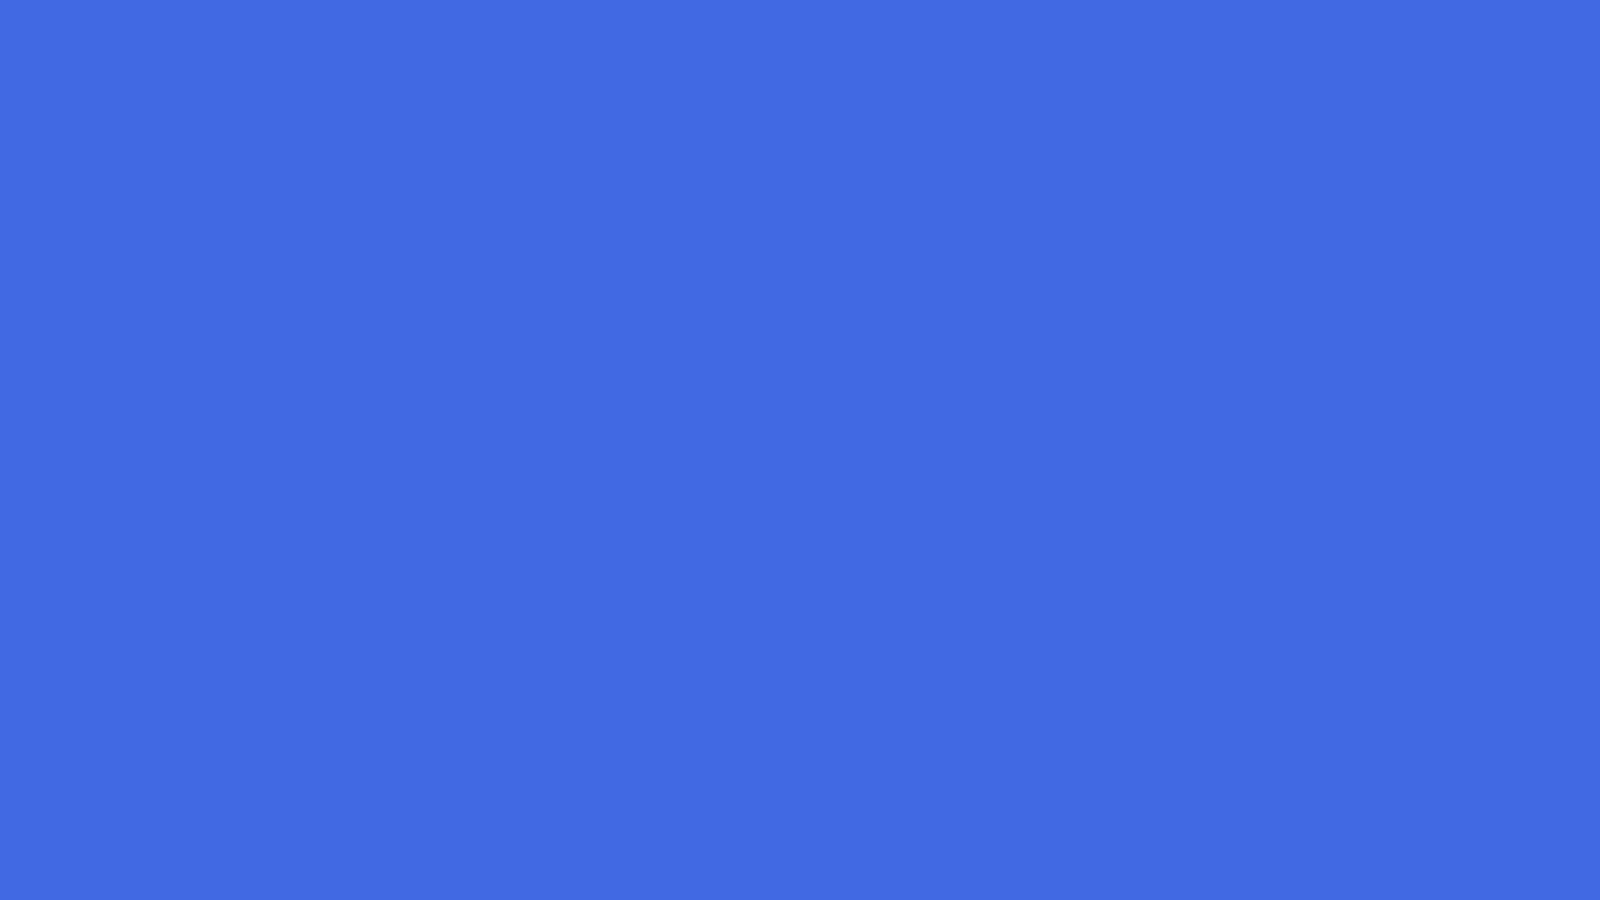 1600x900 royal blue web solid color background